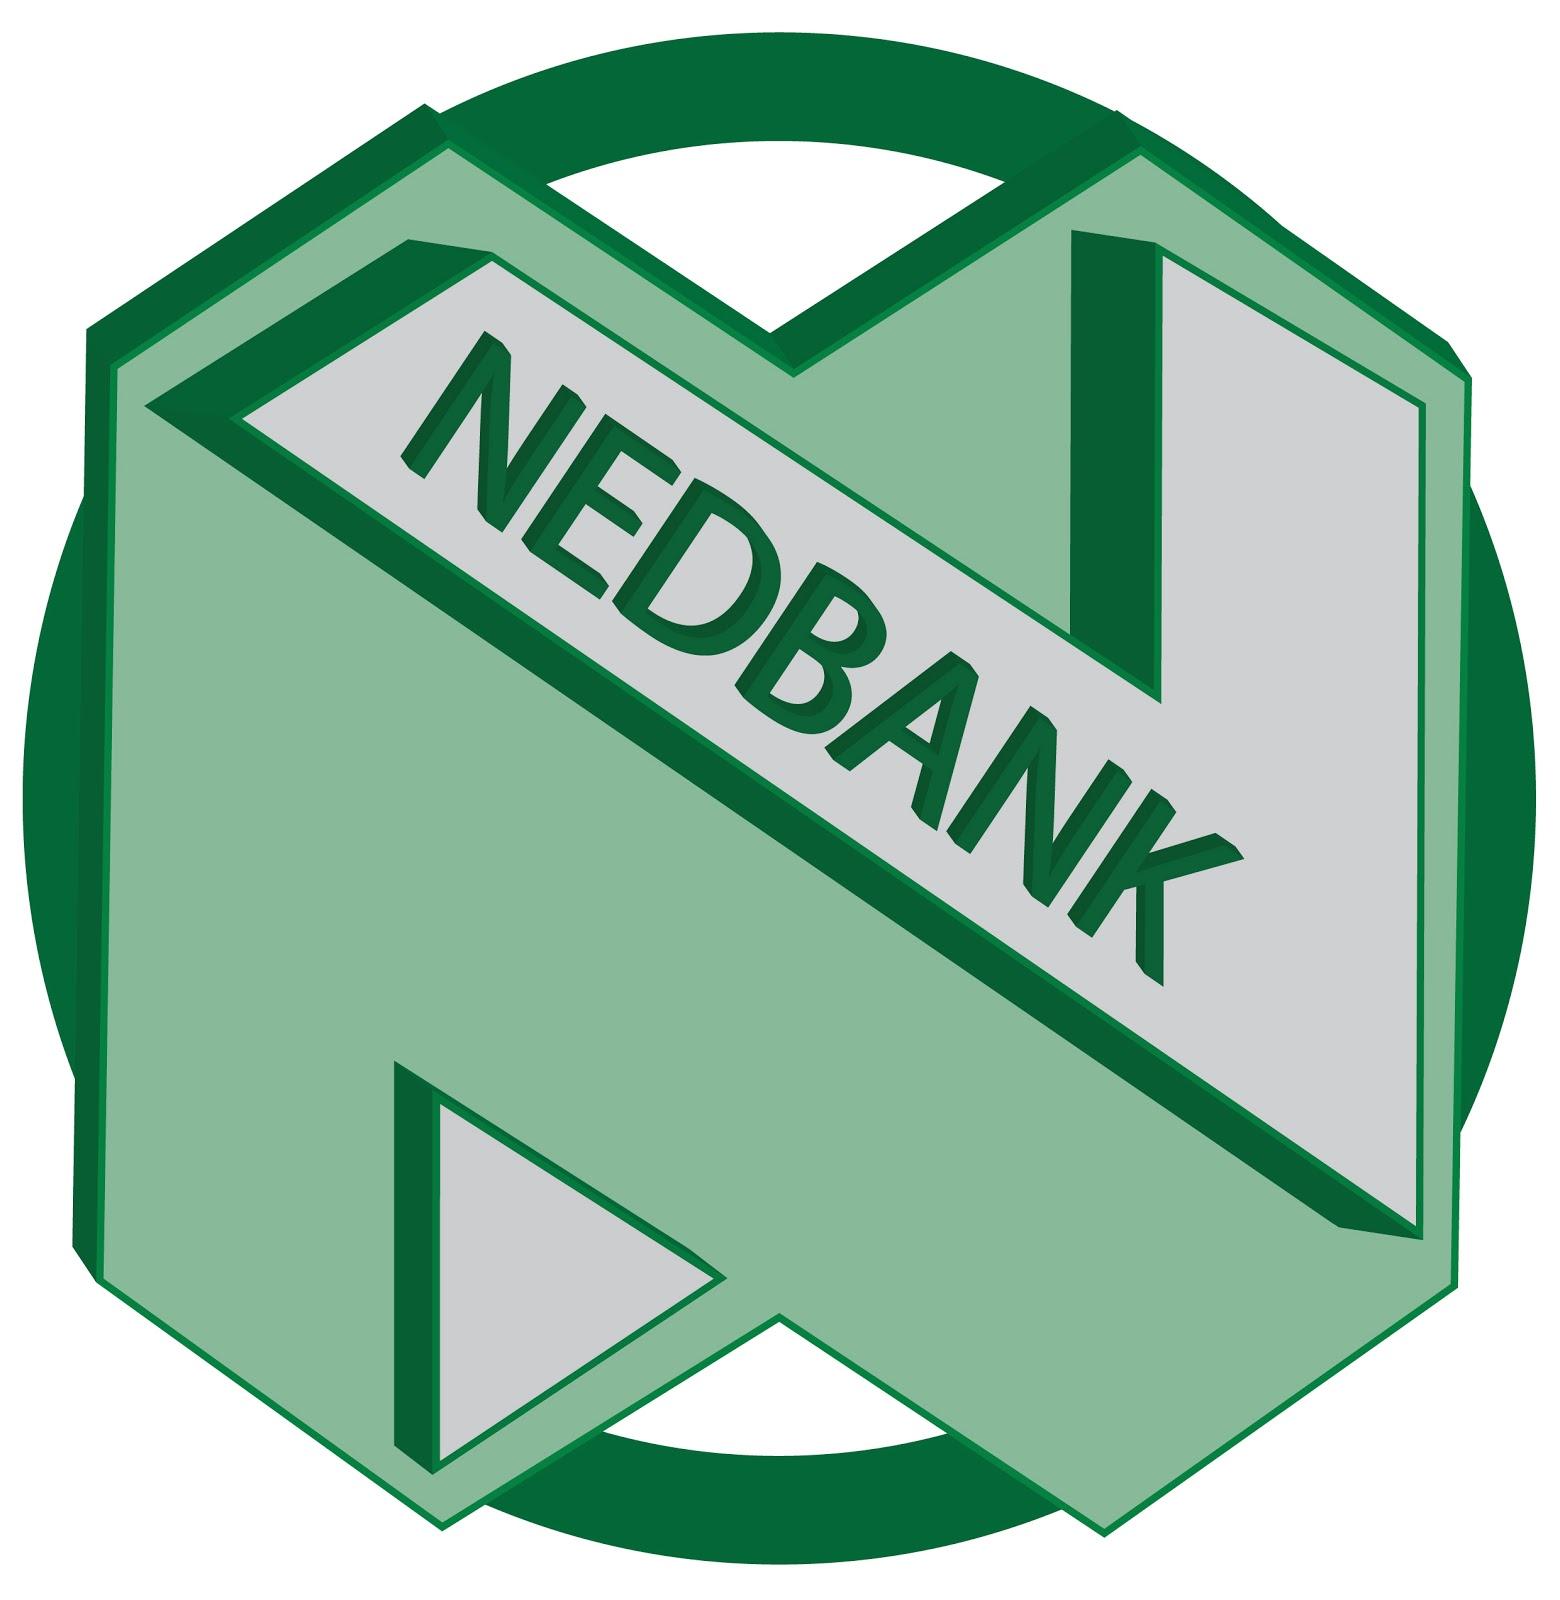 Zizo Devilish Manona: Nedbank logo redesign.